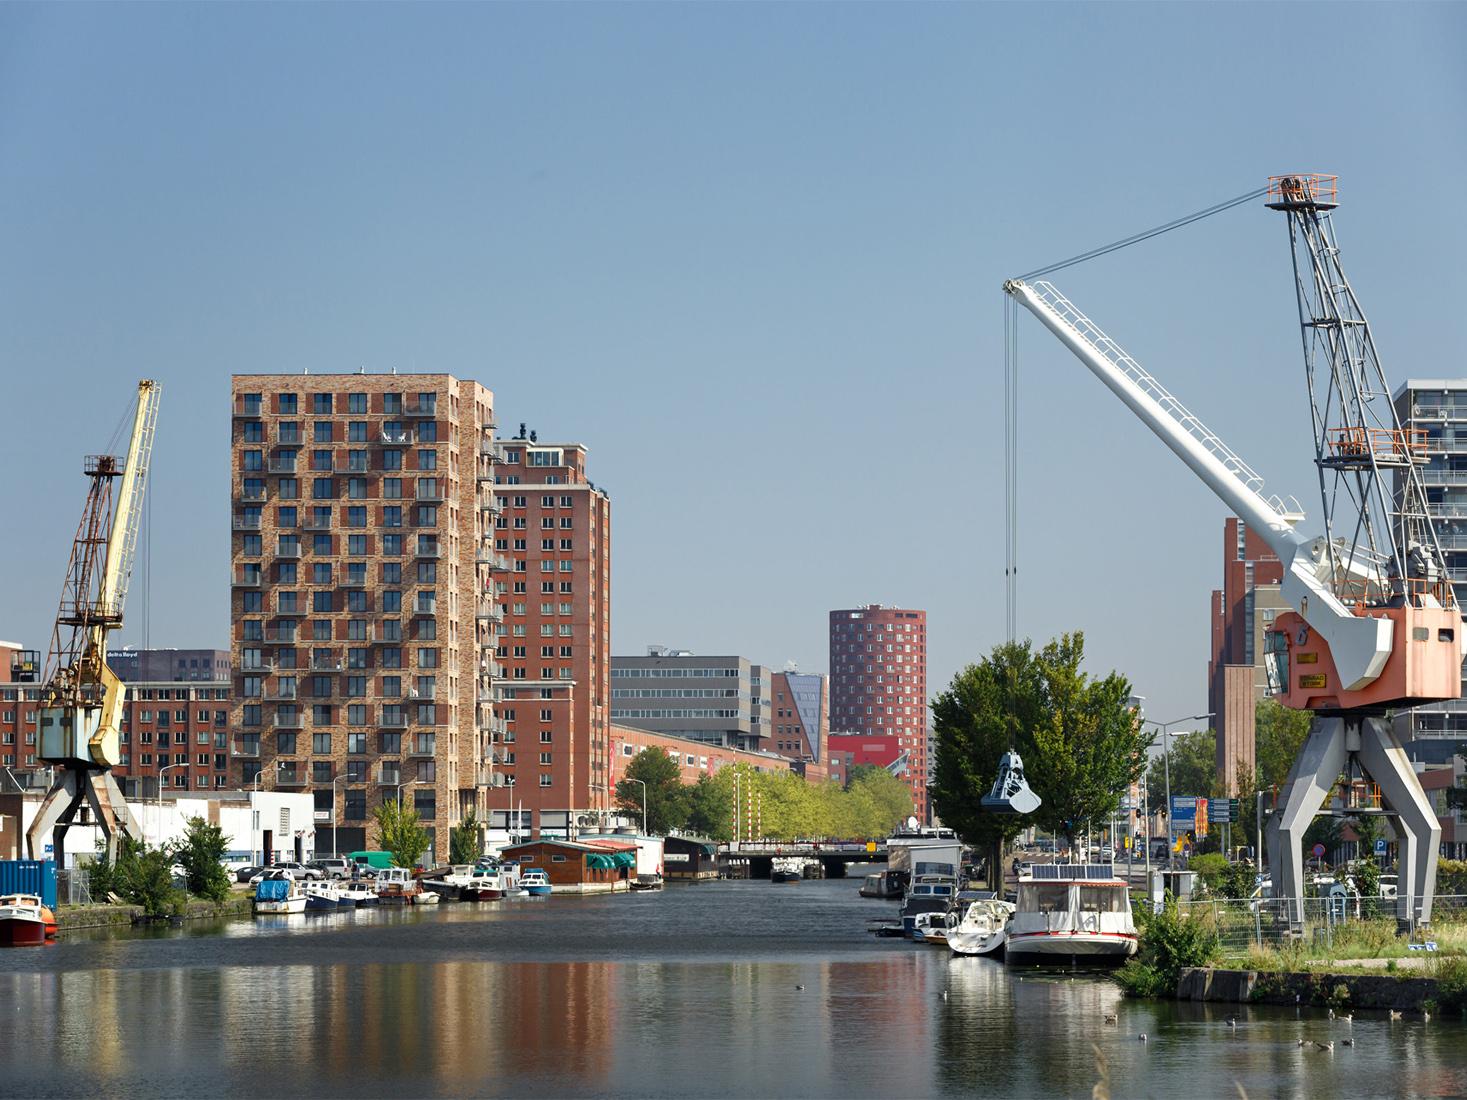 woningbouw Caland Tower Laakhaven Den Haag